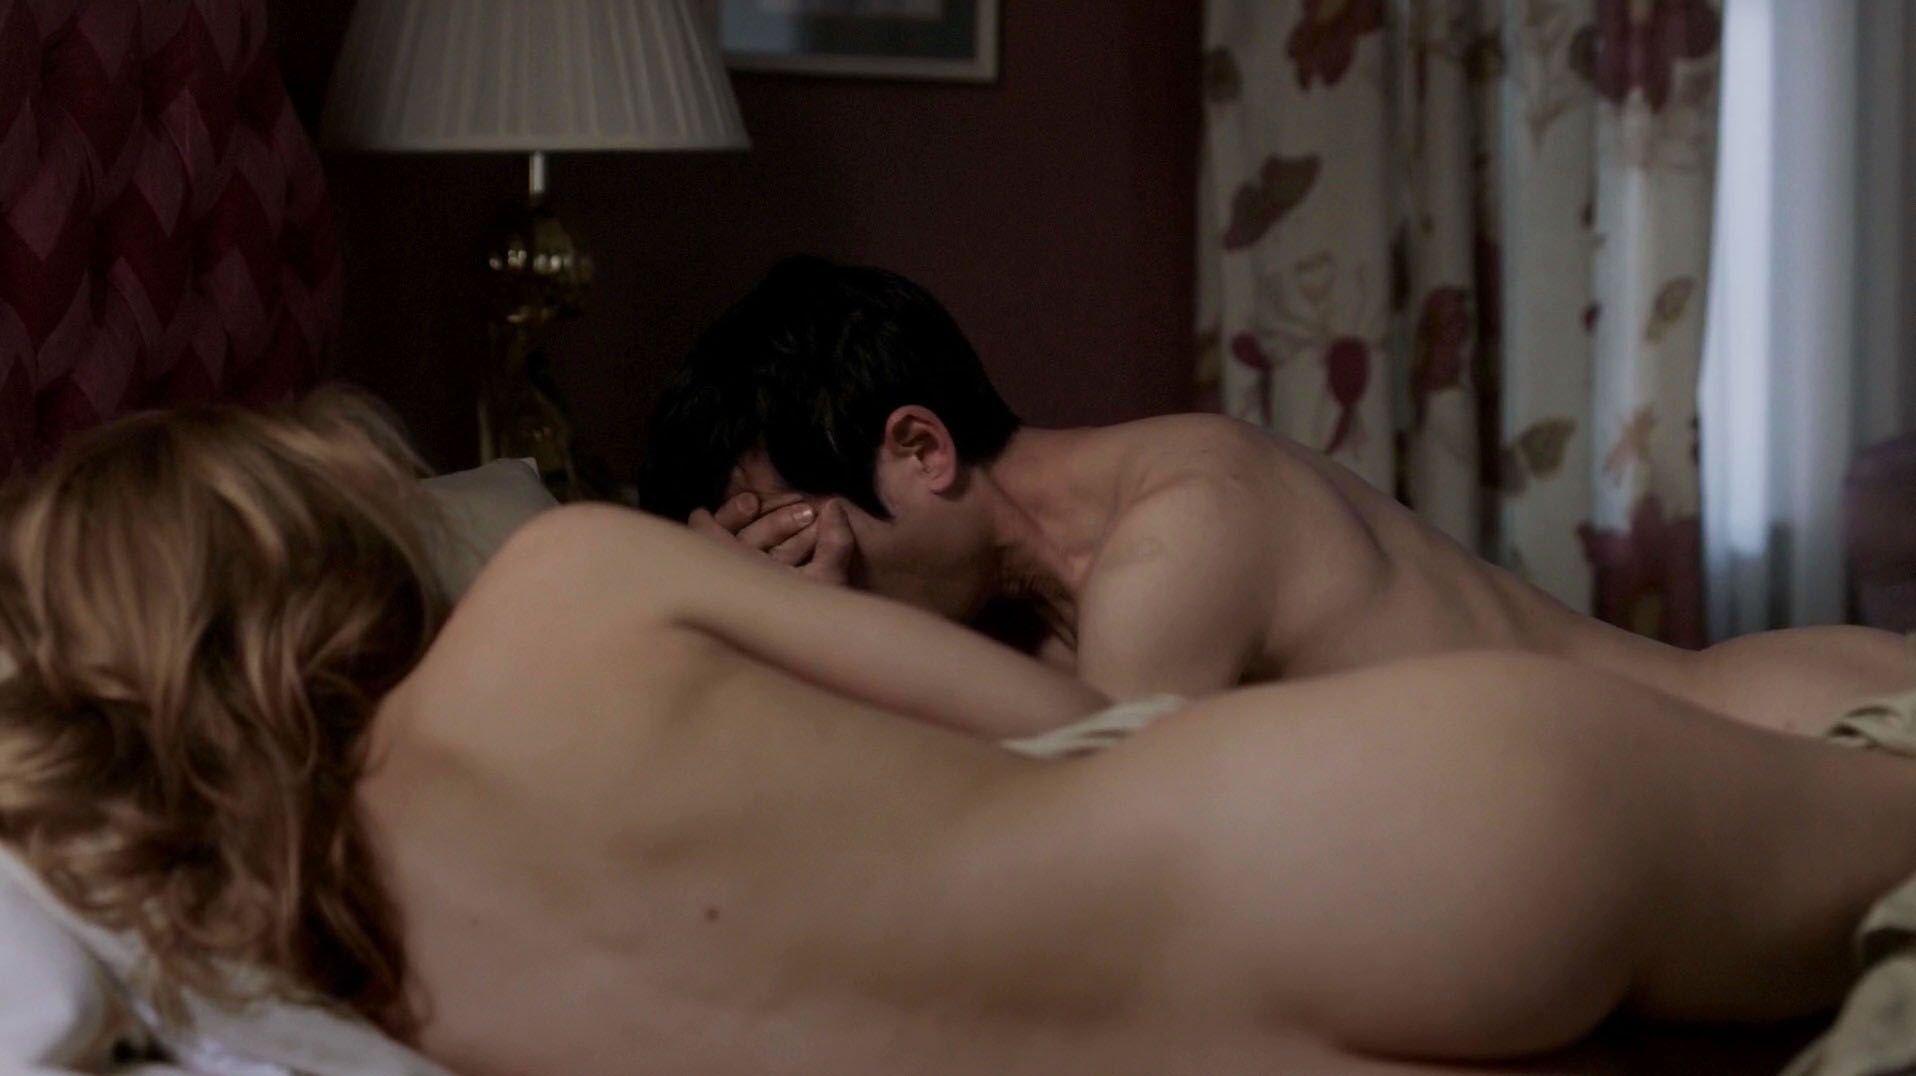 Keri russell nude naked